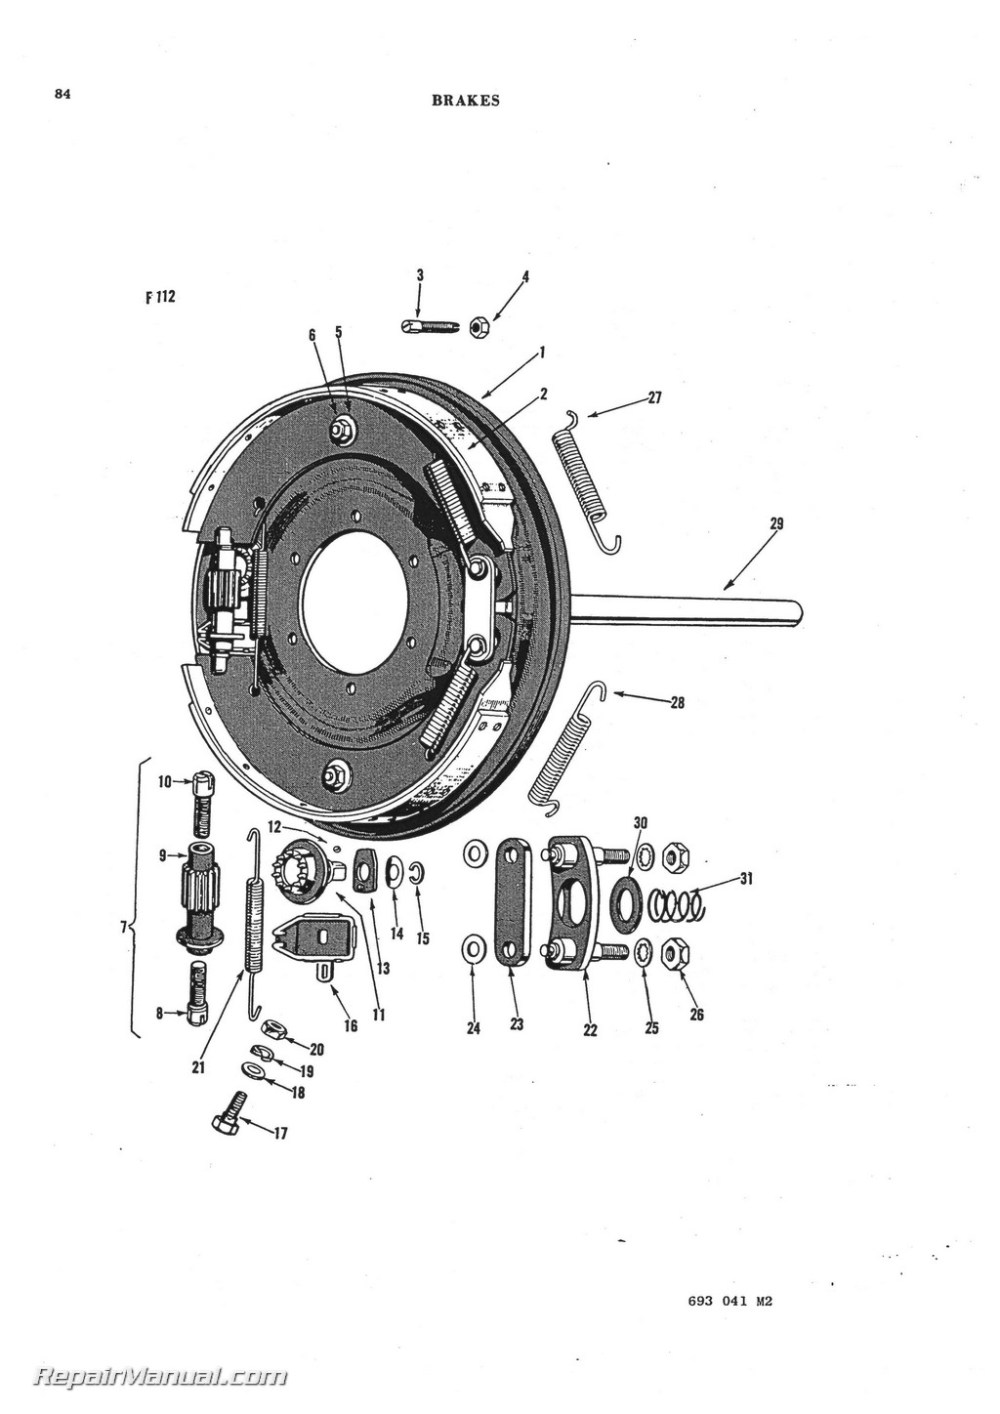 medium resolution of massey ferguson to20 wiring diagram wiring library rh 62 codingcommunity de ferguson to20 tractor wiring diagram ferguson to20 tractor wiring diagram